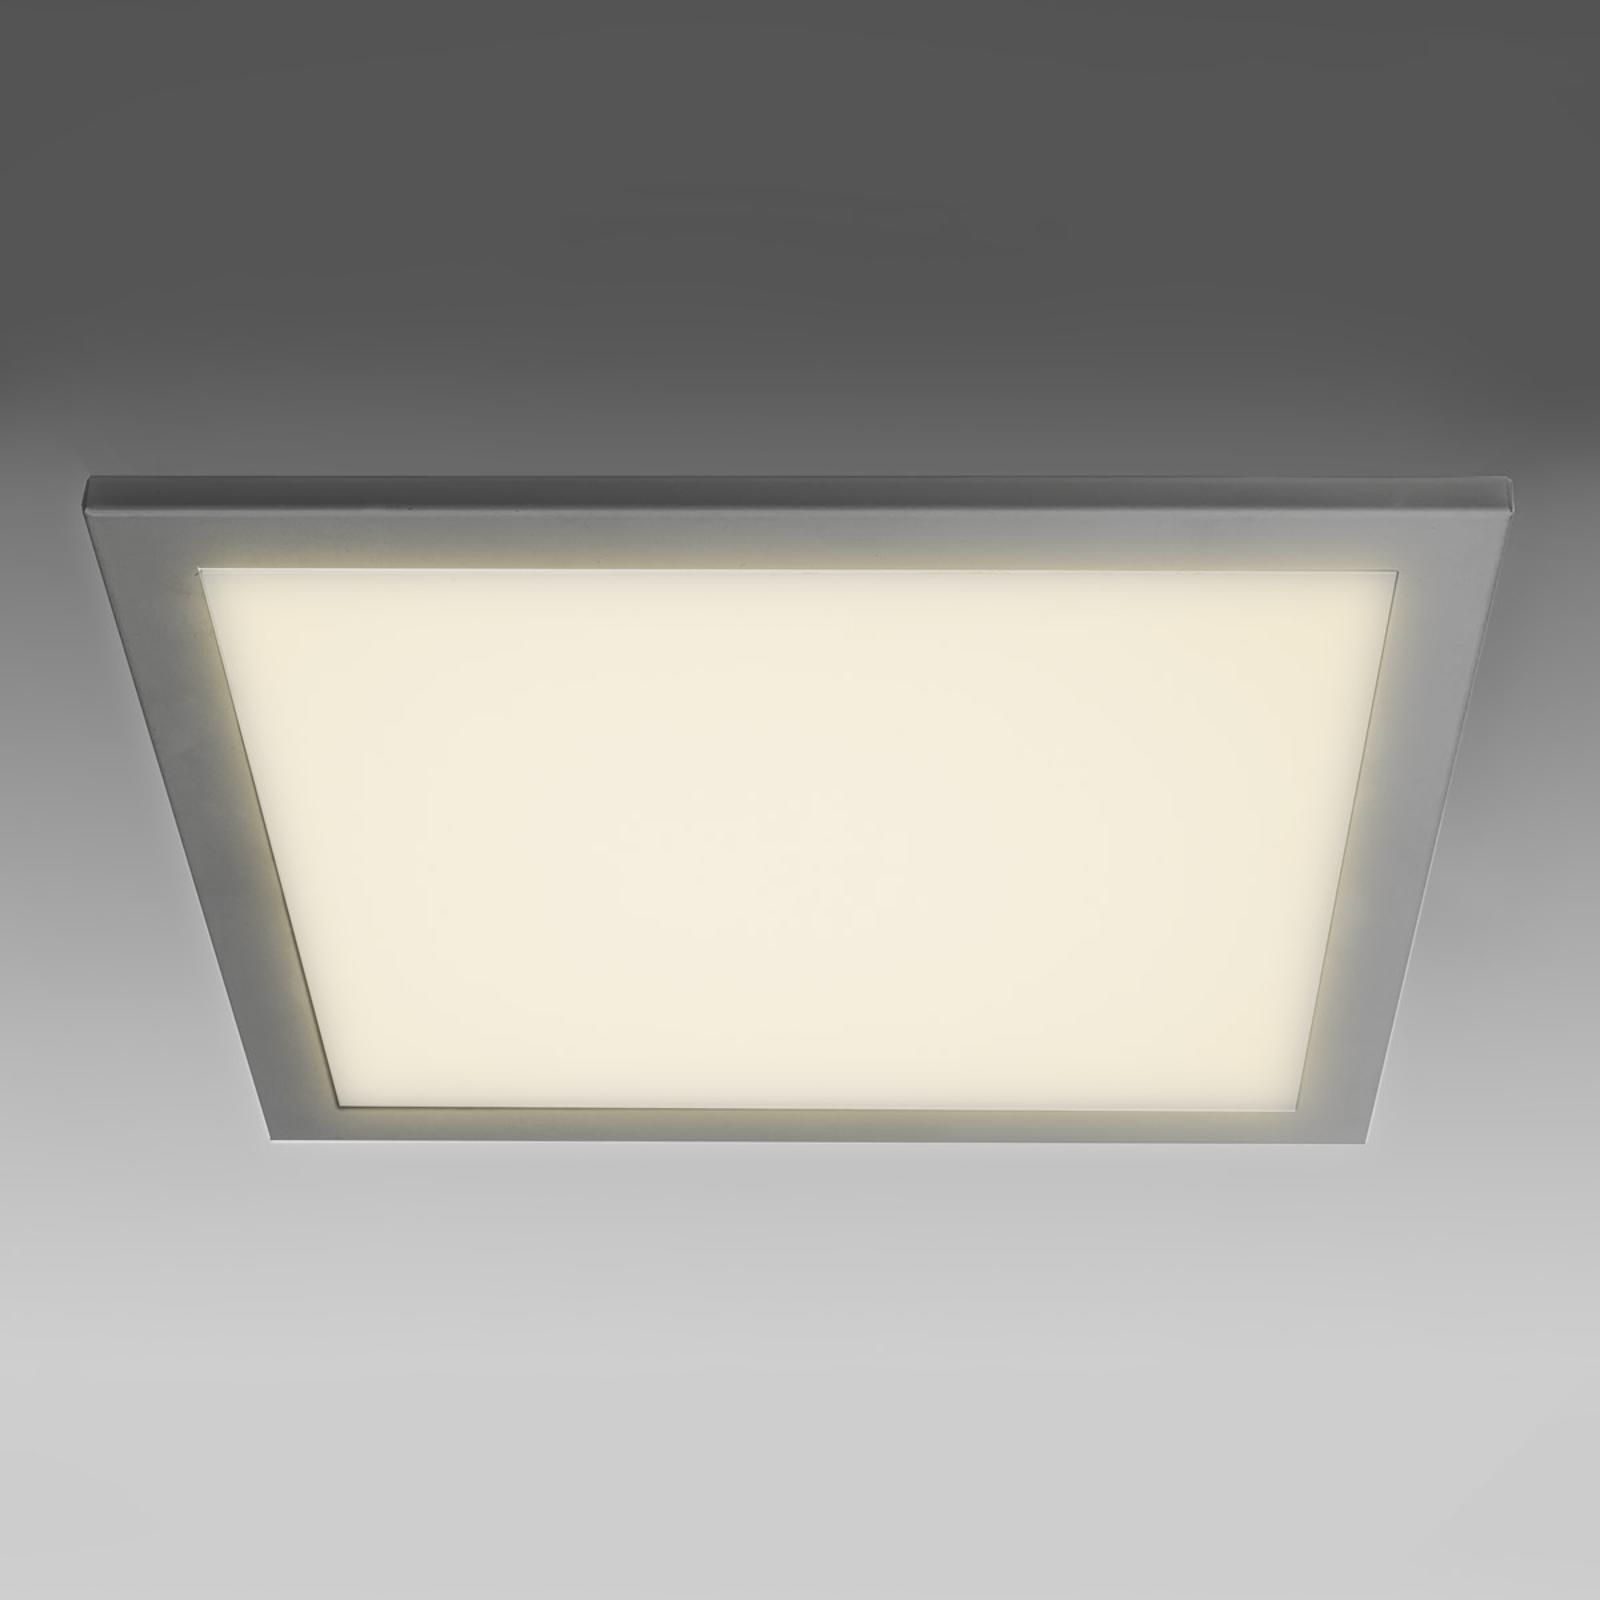 Ultraflache LED Deckeneinbauleuchte SUN 9, silb.3K